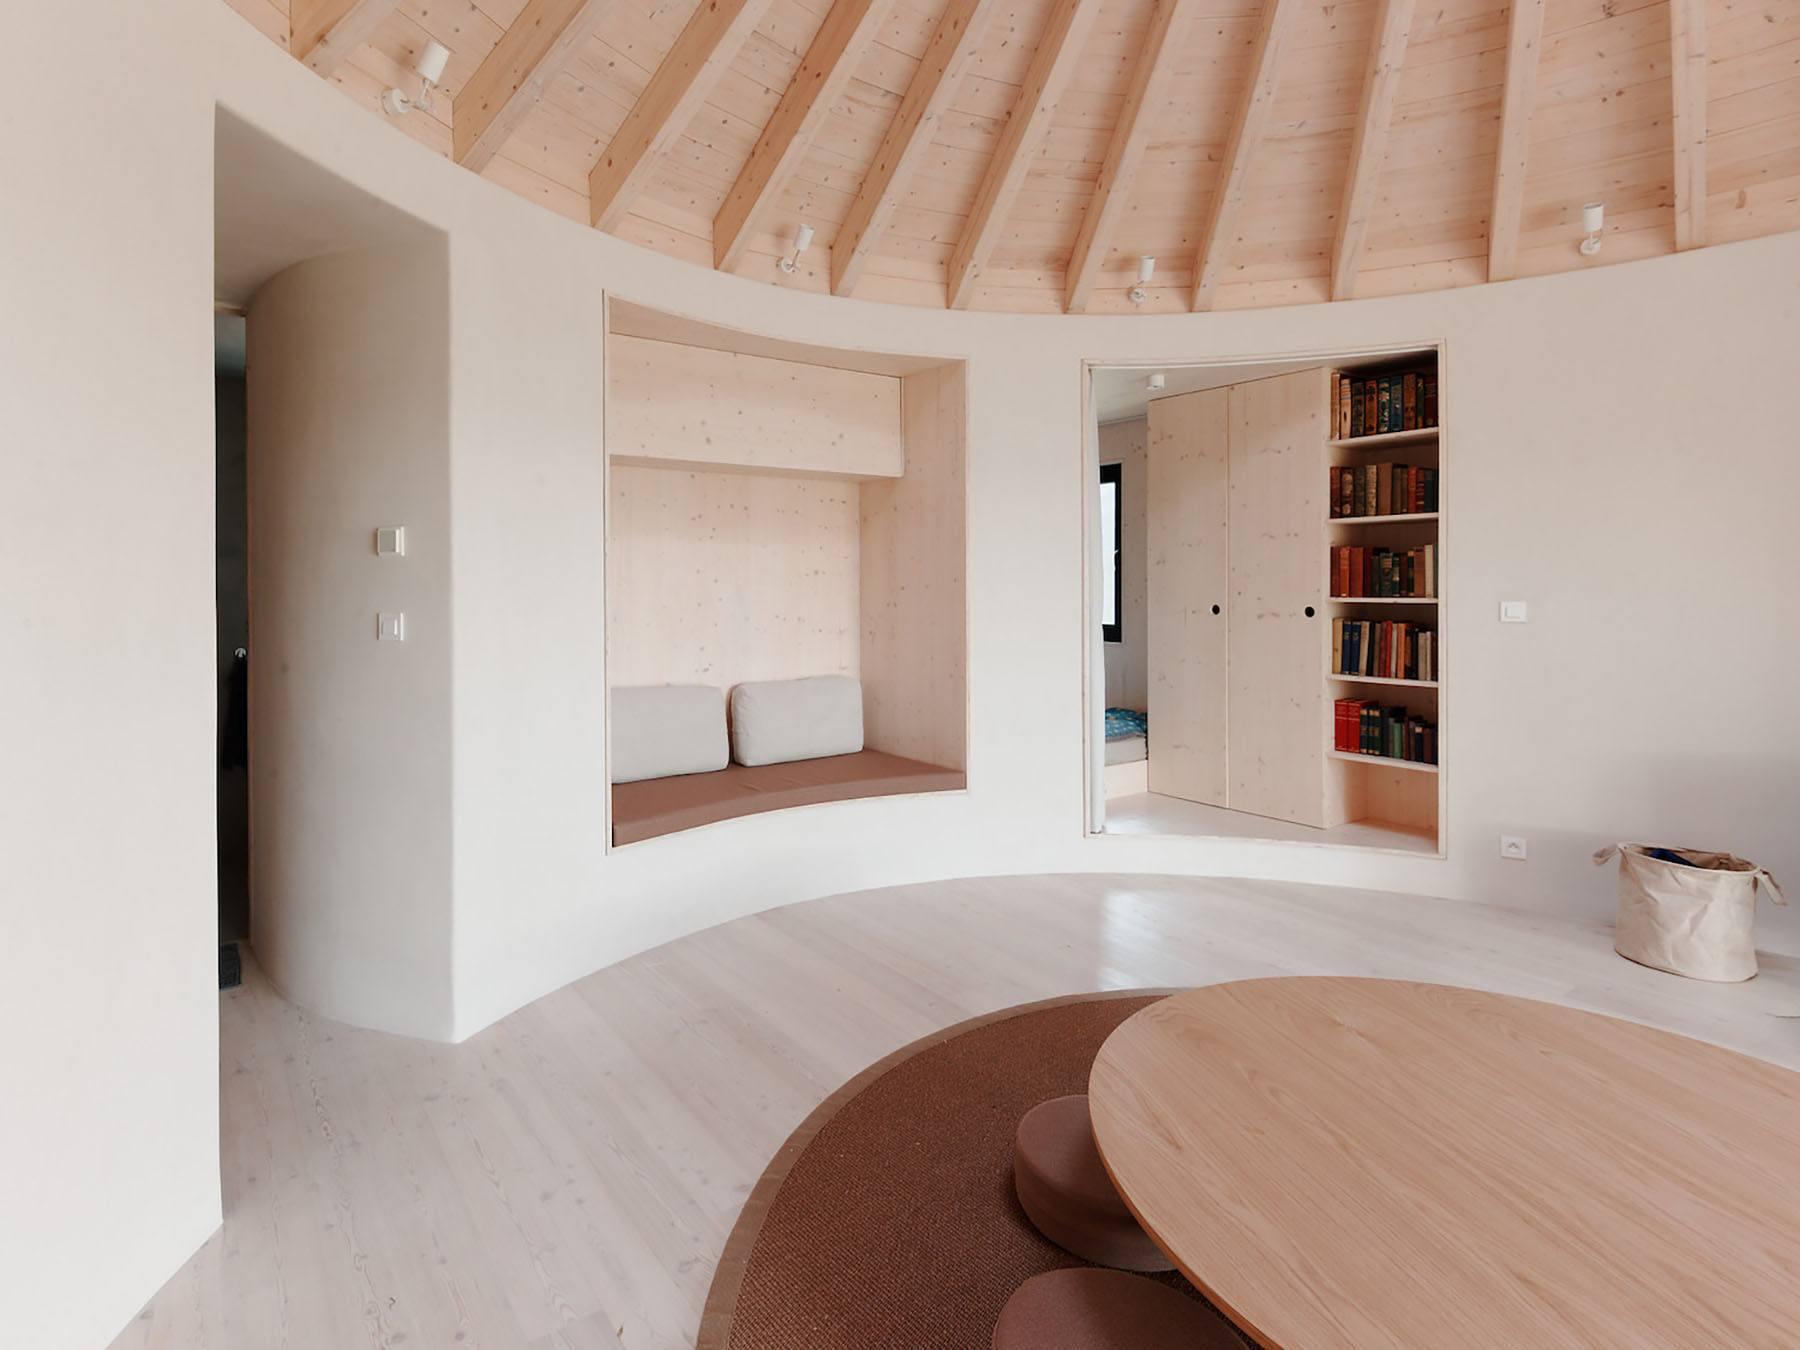 IGNANT-Architecture-JRKVC-Attila-14